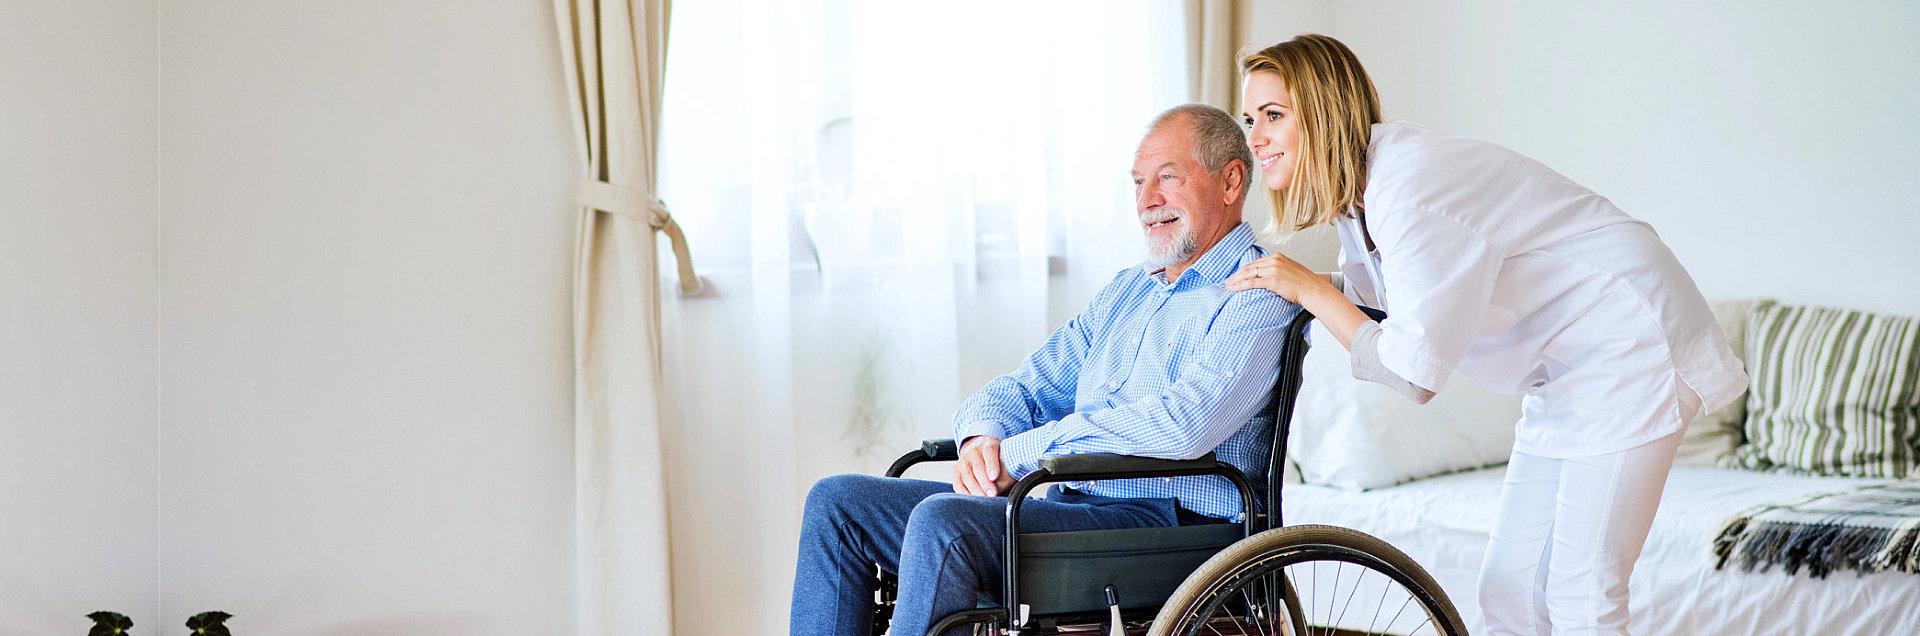 caregiver and elderly man in a wheelchair